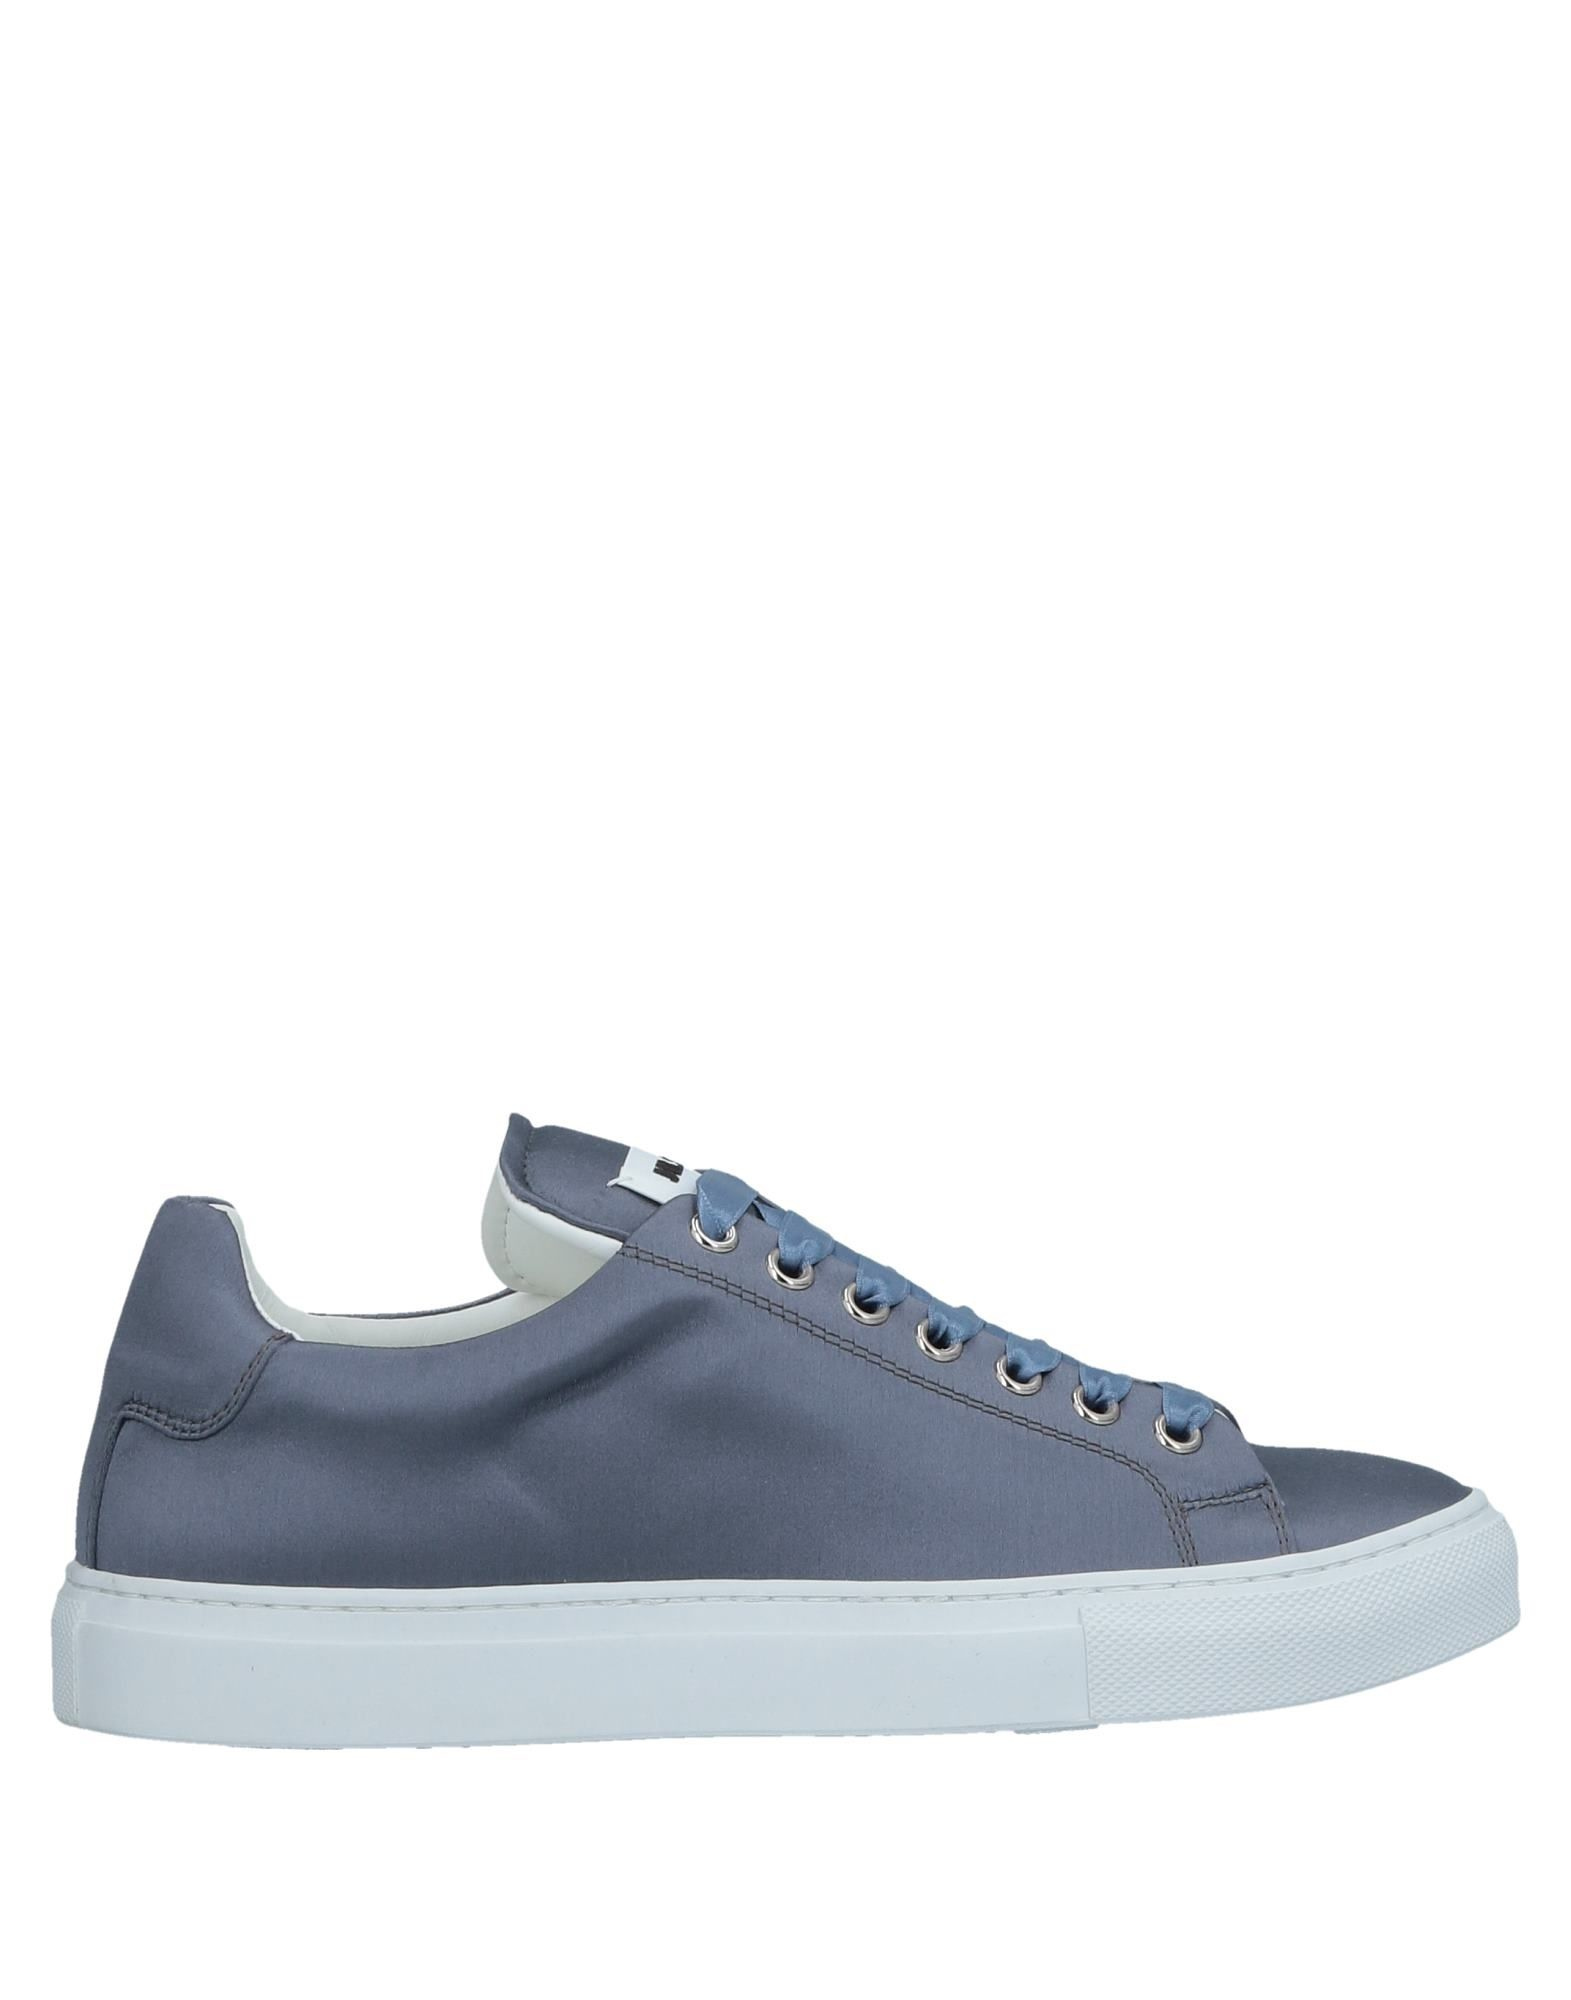 Jil Sander Beliebte Sneakers Damen  11520021XL Beliebte Sander Schuhe bd867c